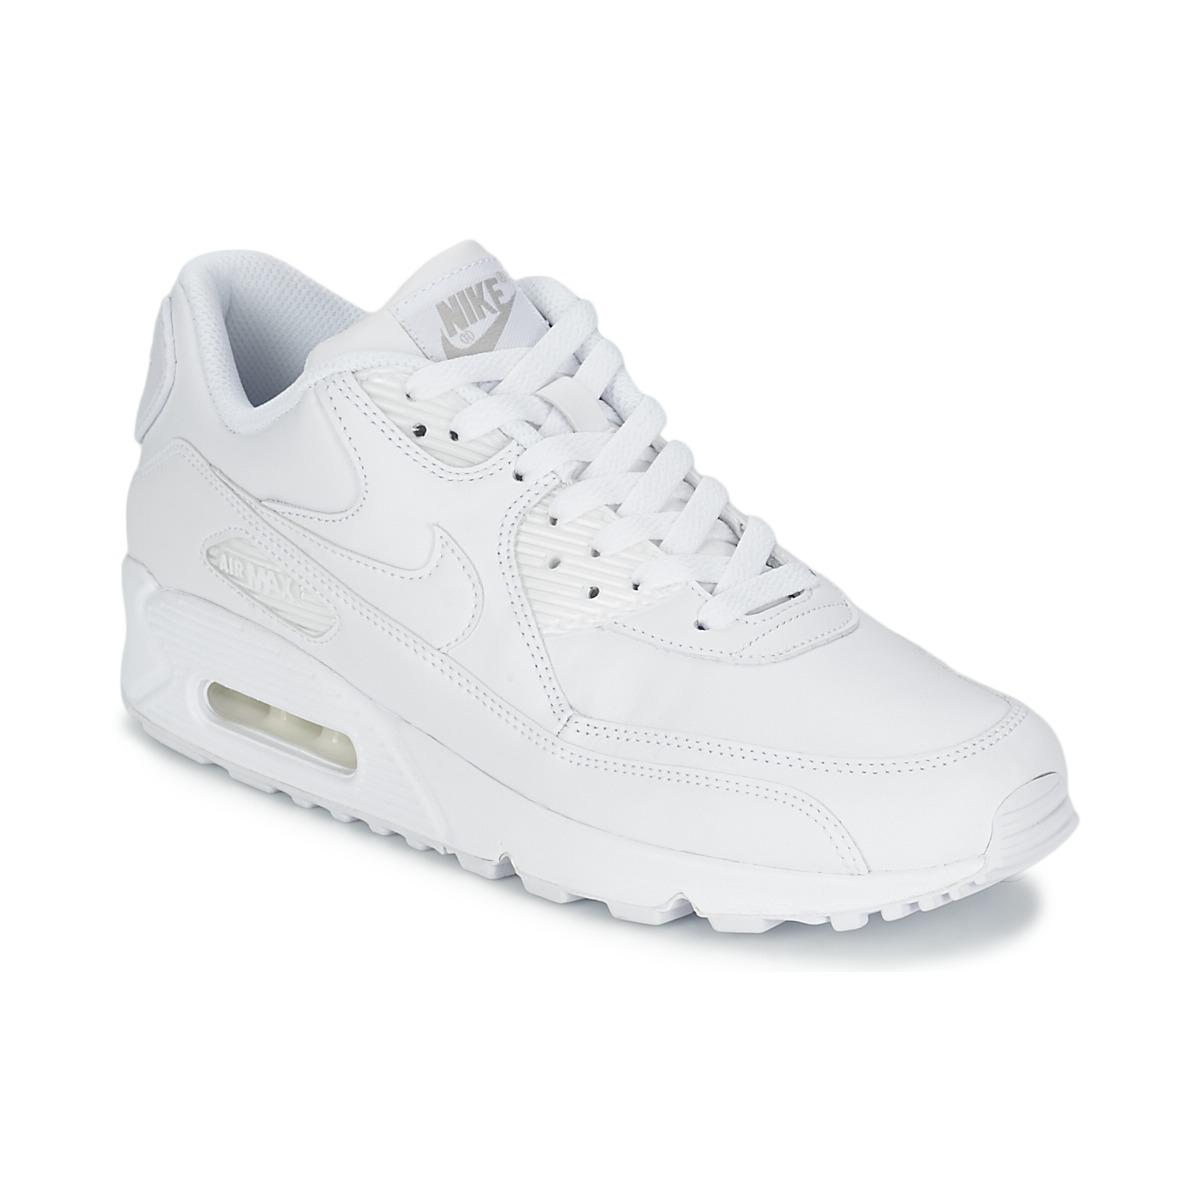 sports shoes c3470 3e9f7 Nike AIR MAX 90 White - Ilmainen toimitus osoitteessa Spartoo.fi! ! - kengät  Matalavartiset tennarit Miehet 144,00 €